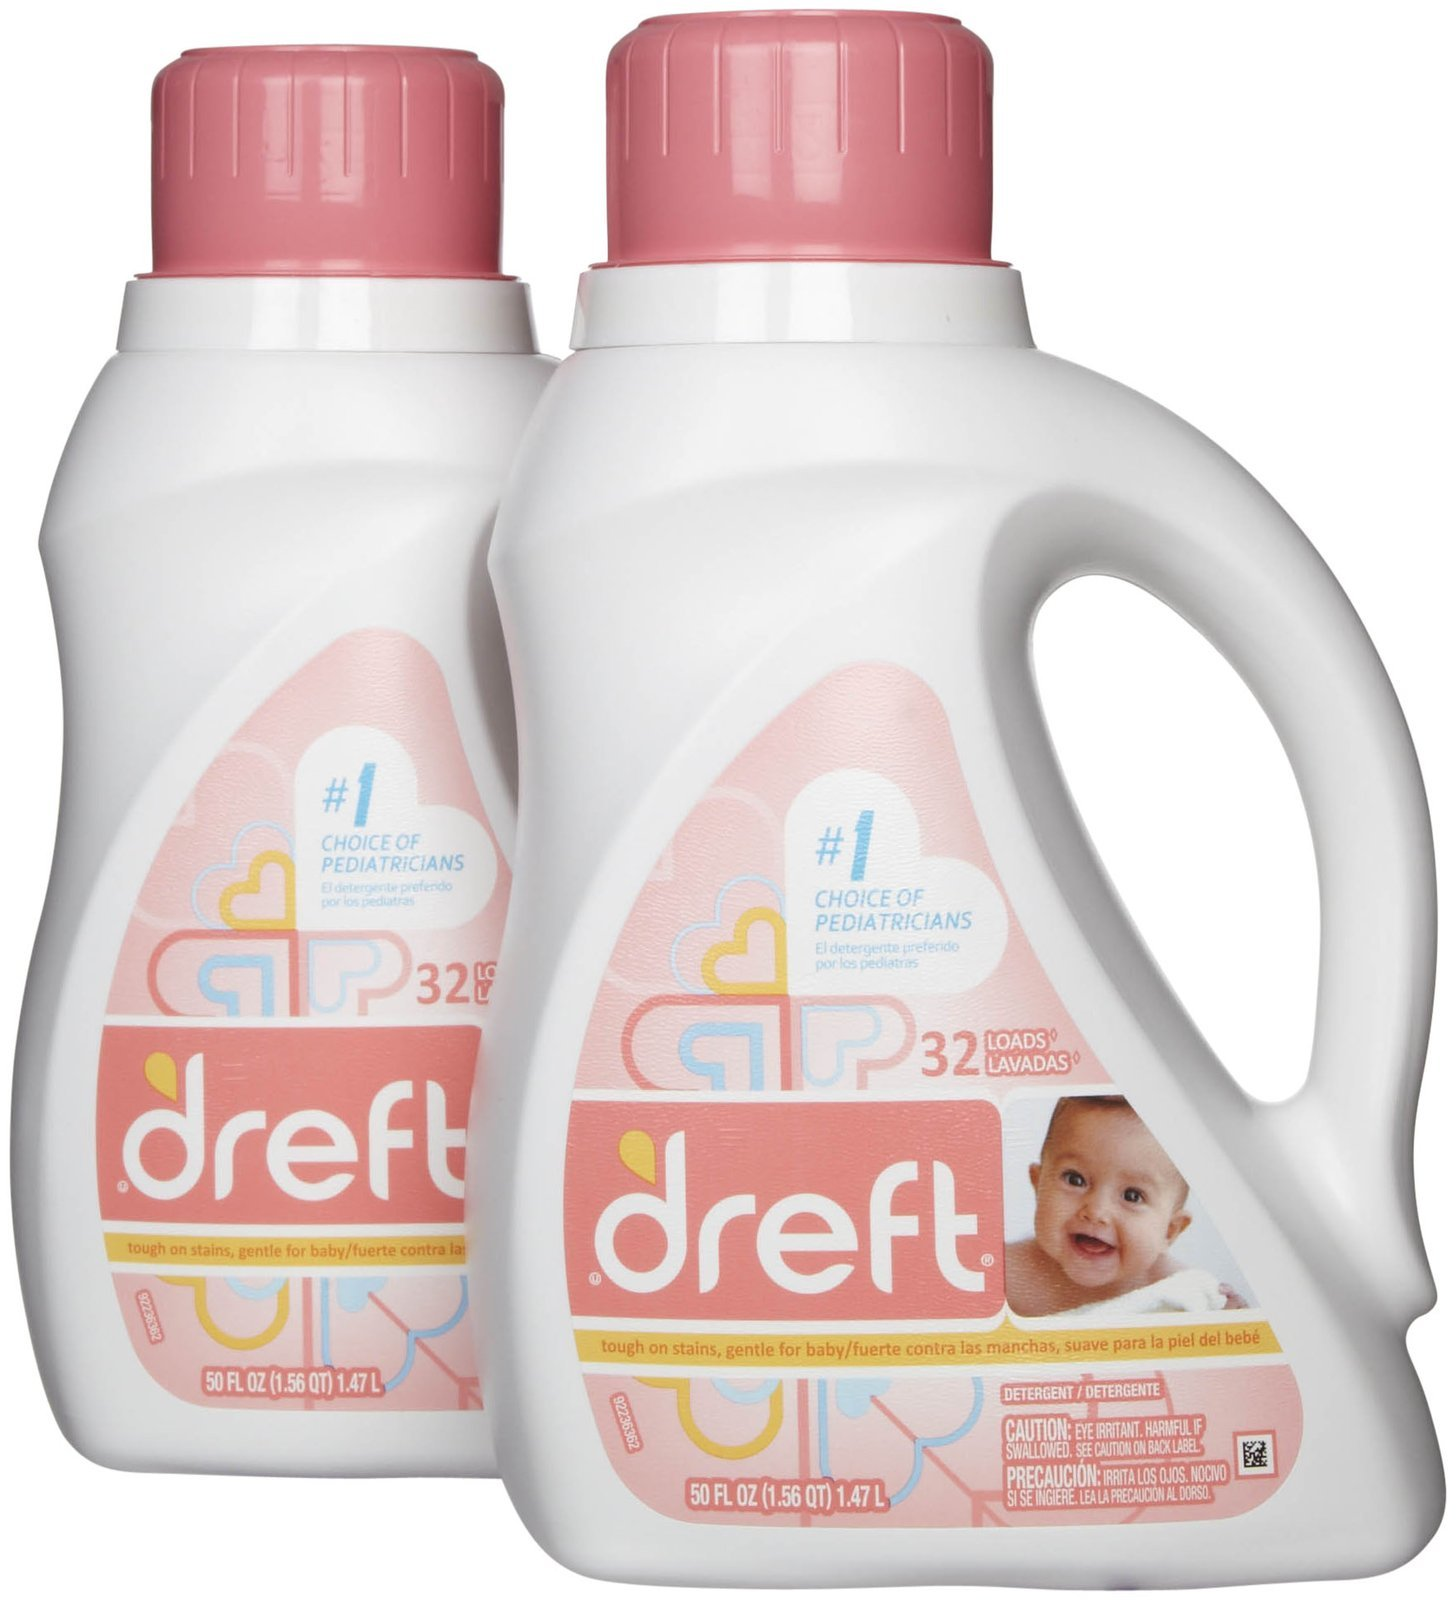 Dreft Baby Laundry Detergent - 50 fl oz - 2 pk